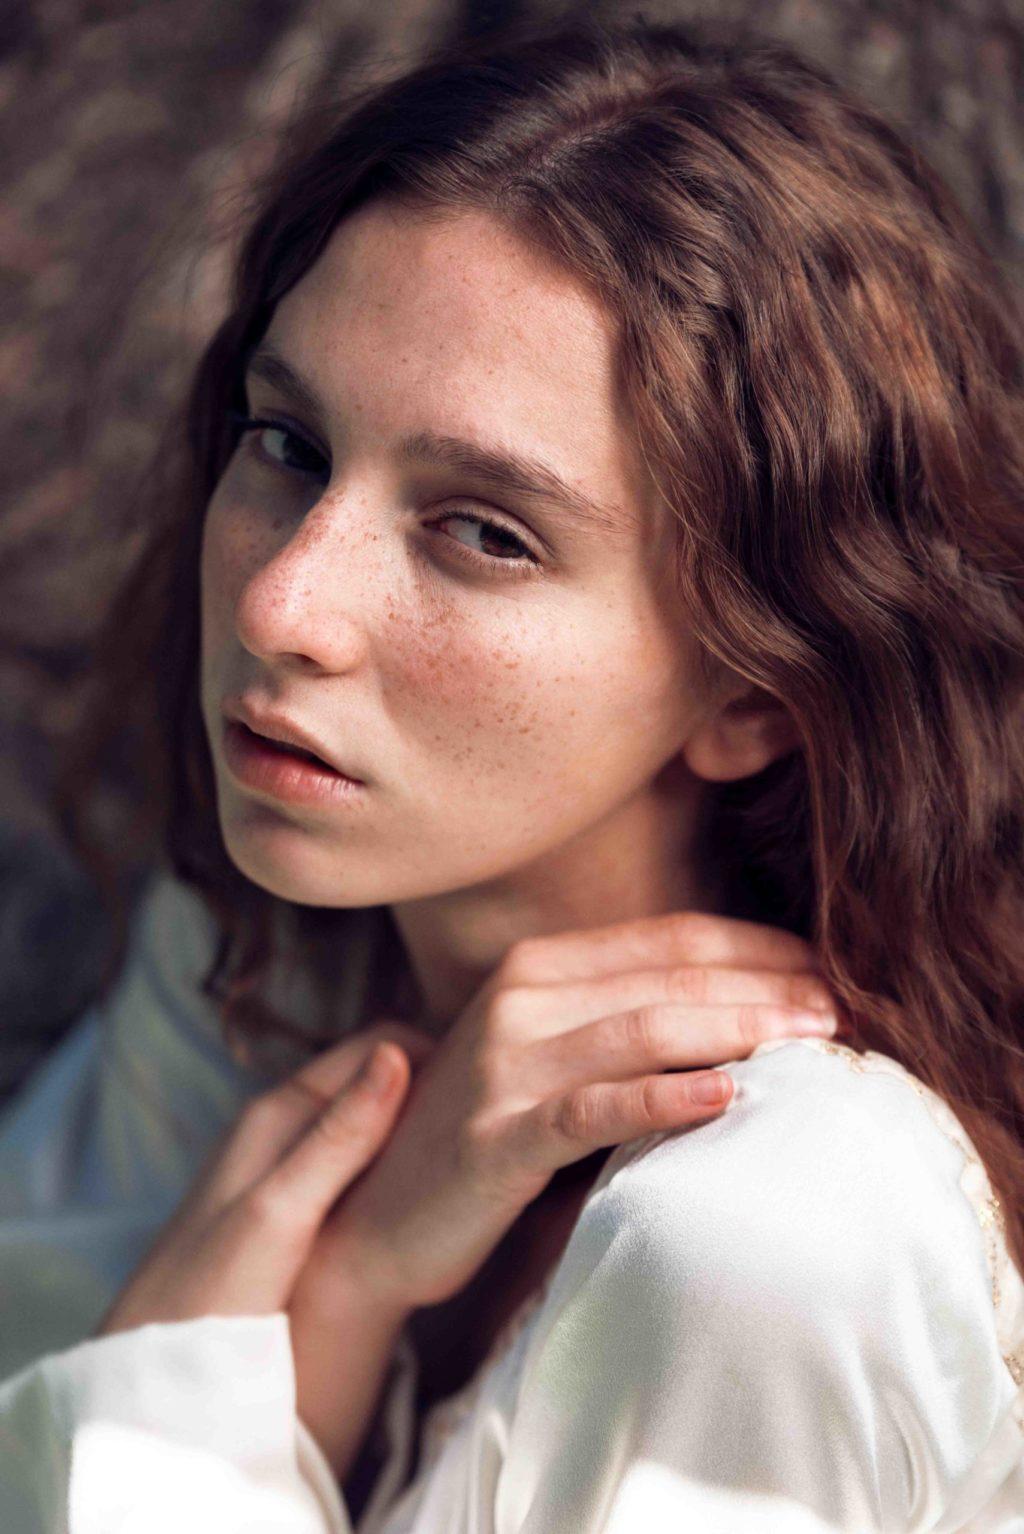 girl, portrait, creative